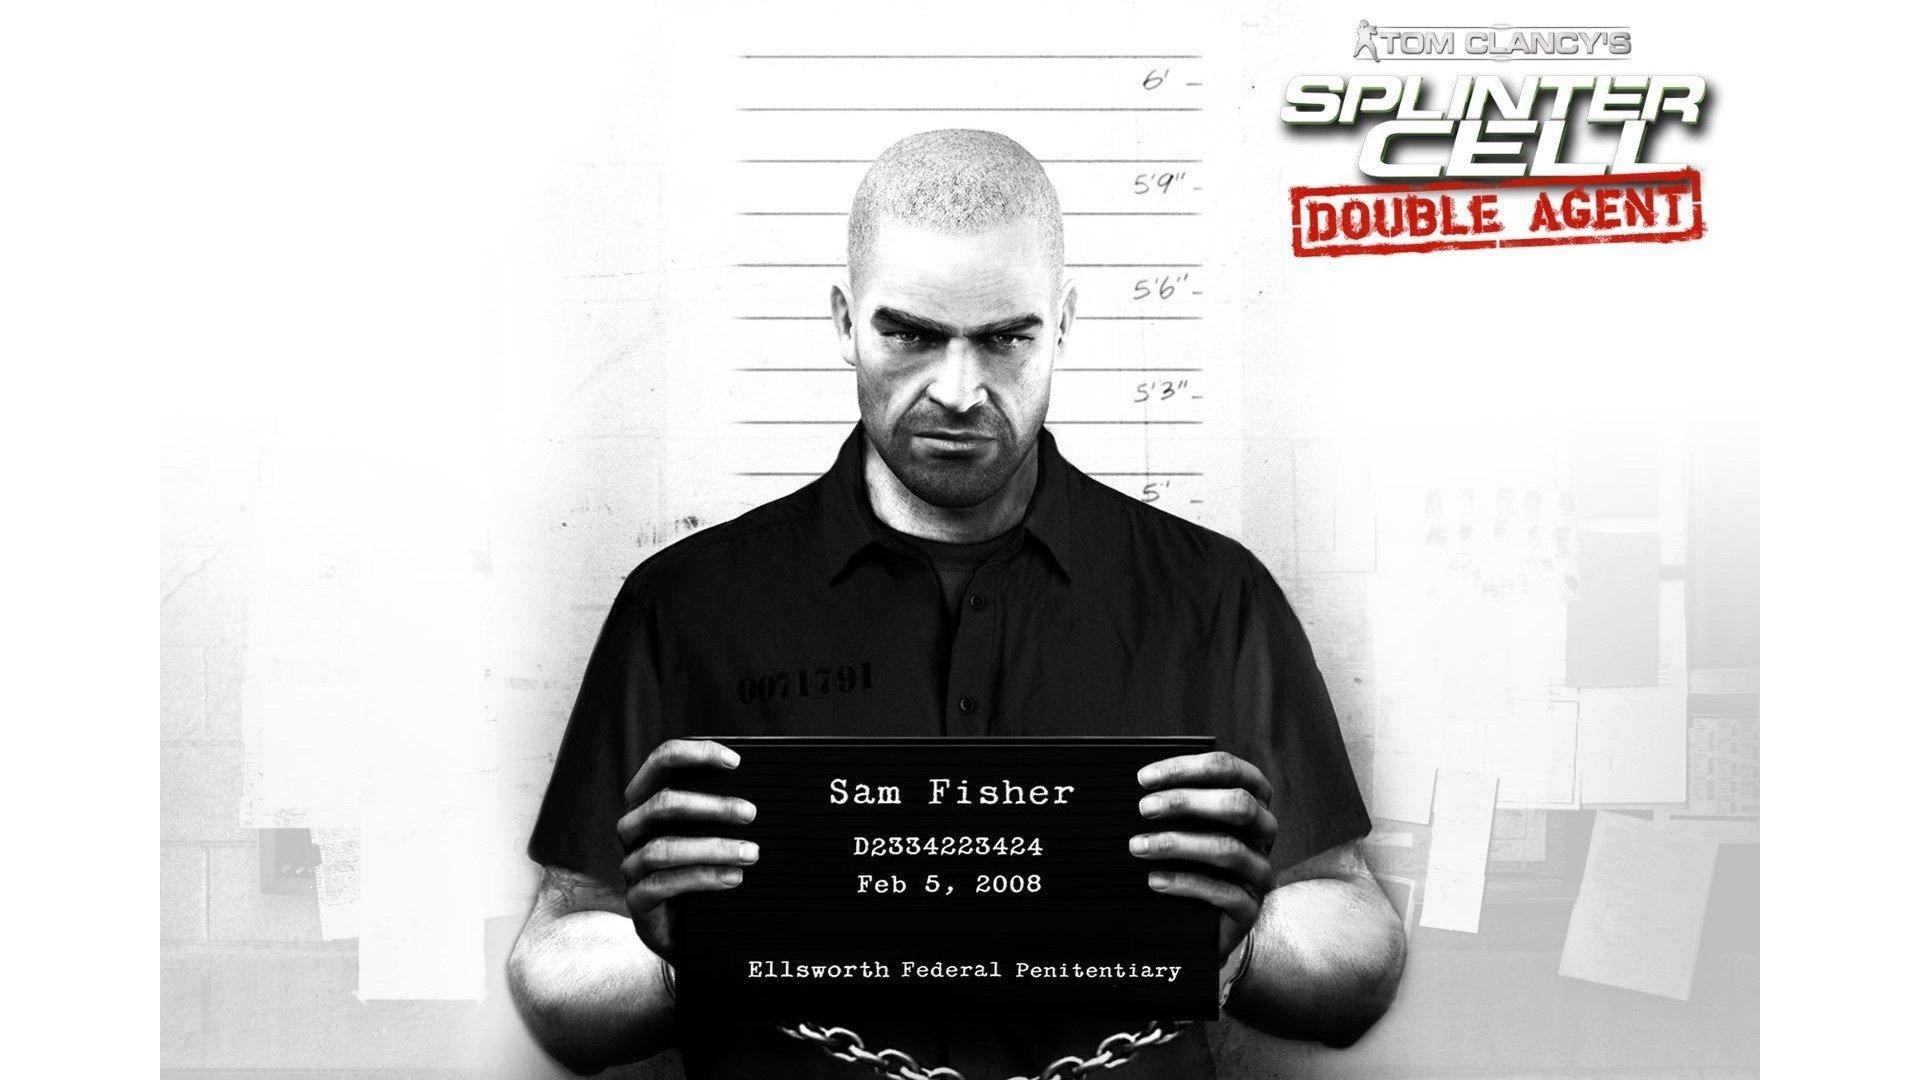 6 Tom Clancy's Splinter Cell: Double Agent Fondos de ... |Splinter Cell Double Agent Wallpaper